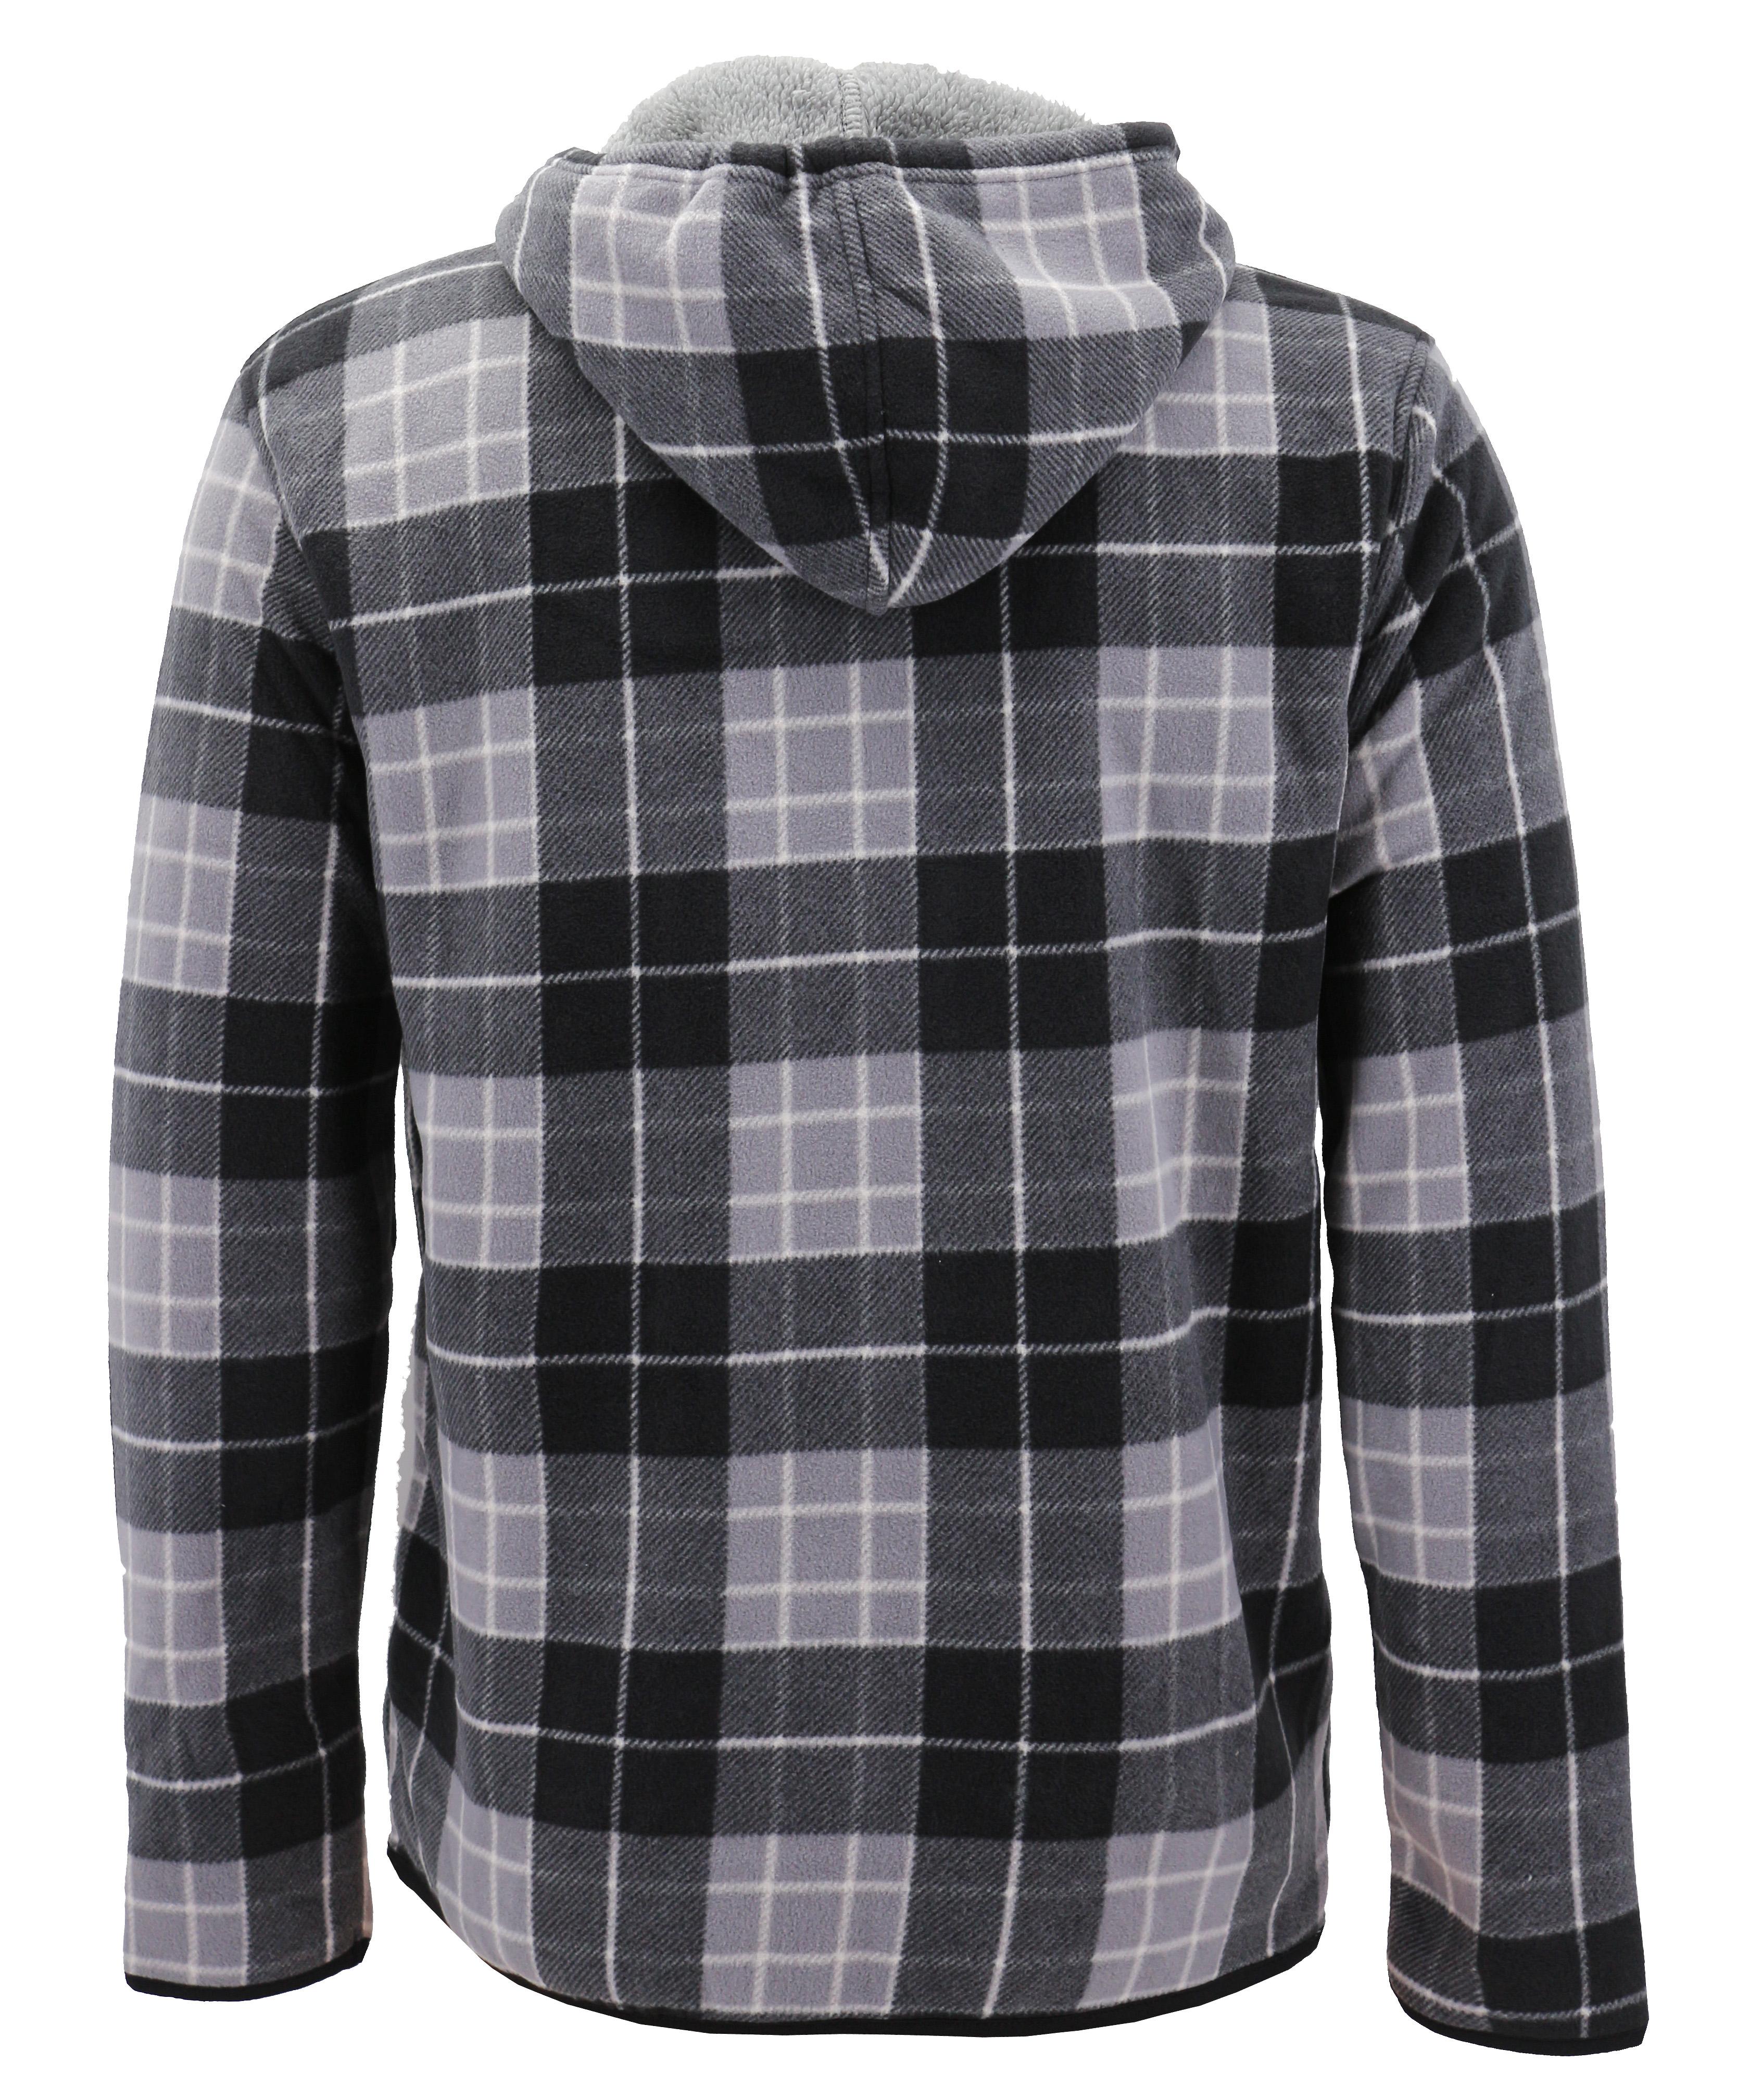 Men-039-s-Casual-Flannel-Zip-Up-Fleece-Lined-Plaid-Sherpa-Hoodie-Lightweight-Jacket thumbnail 15